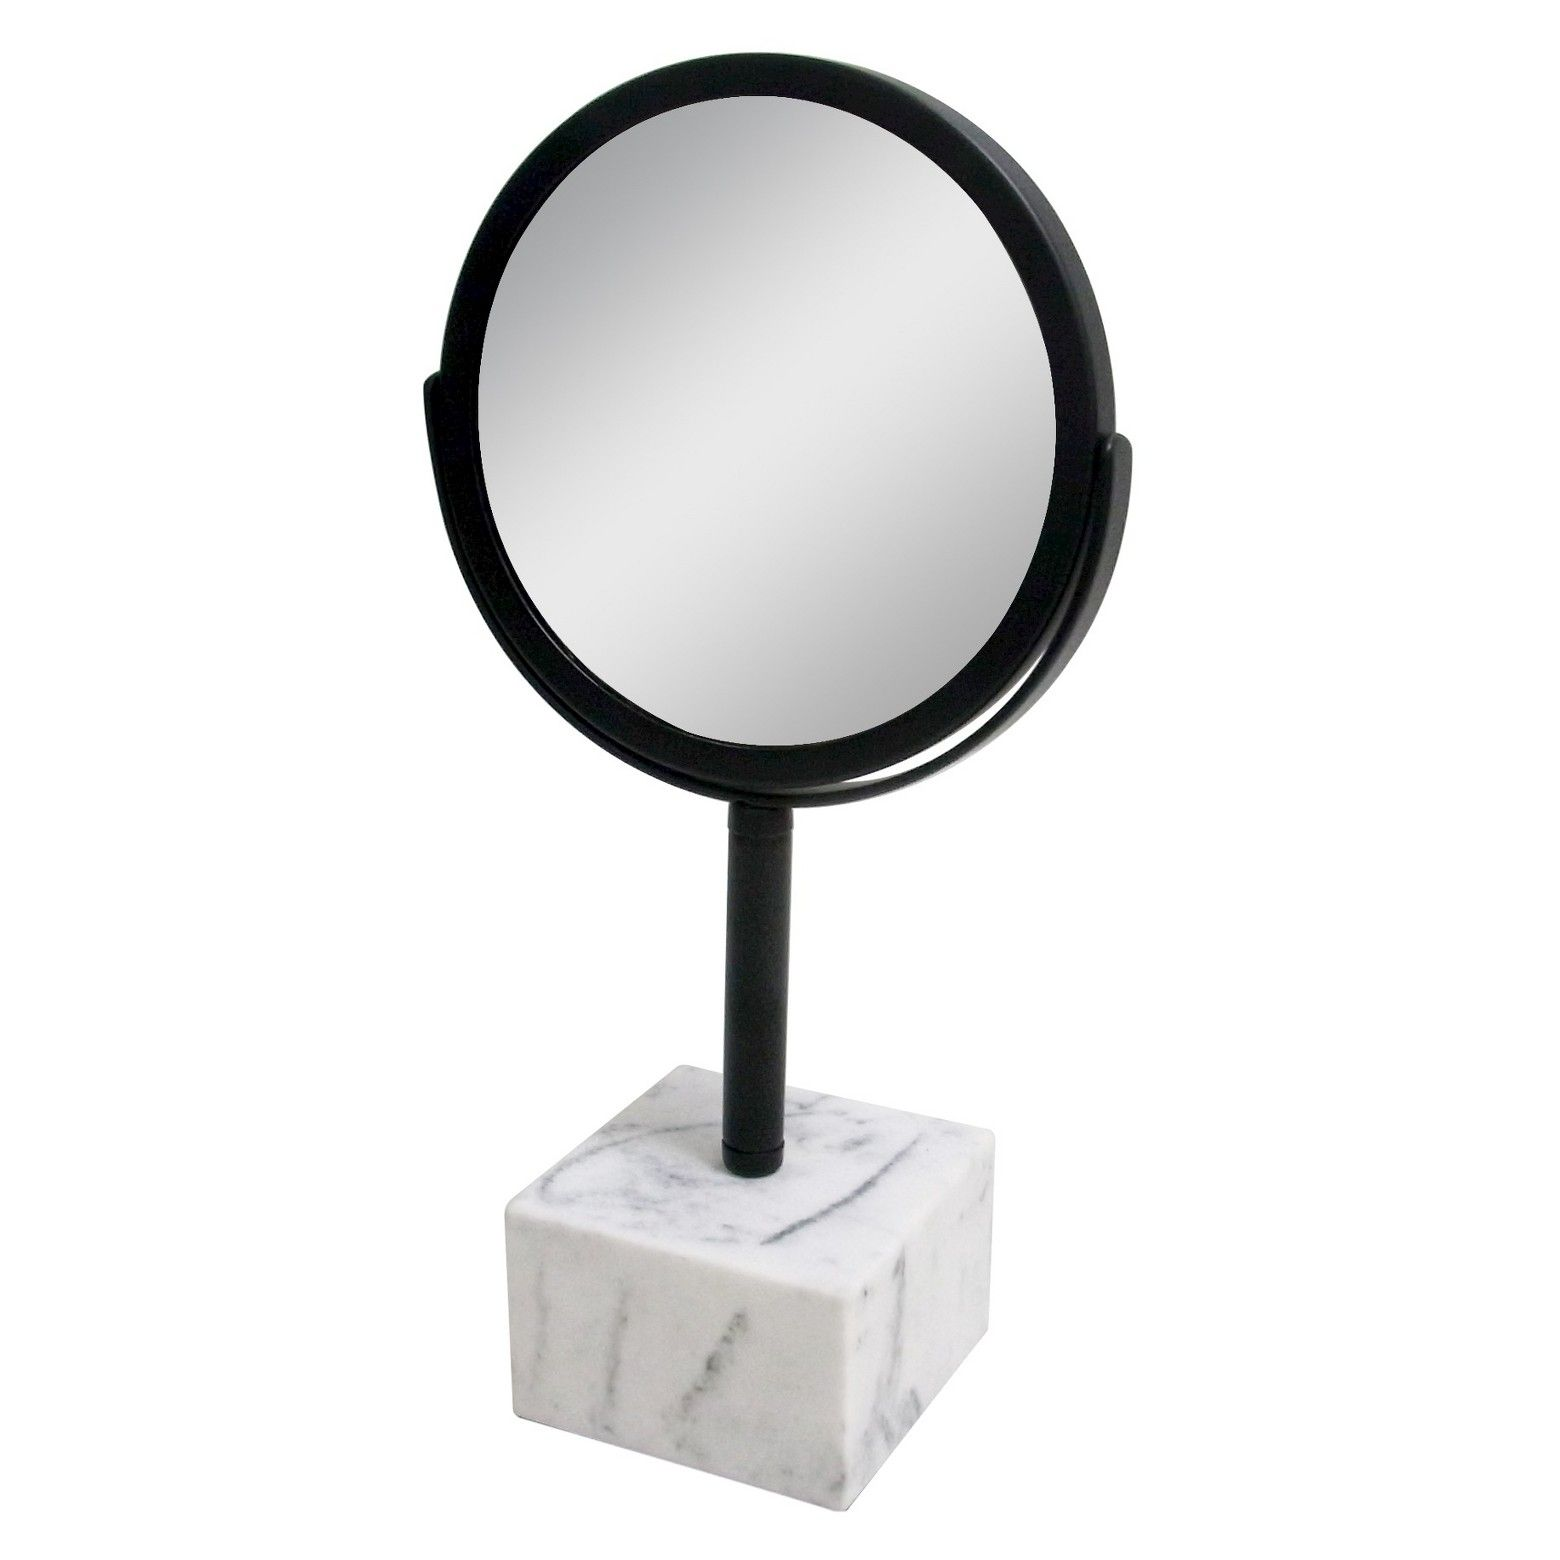 Marbleized Base Bathroom Mirror Black - Nate Berkus | Nate berkus ...